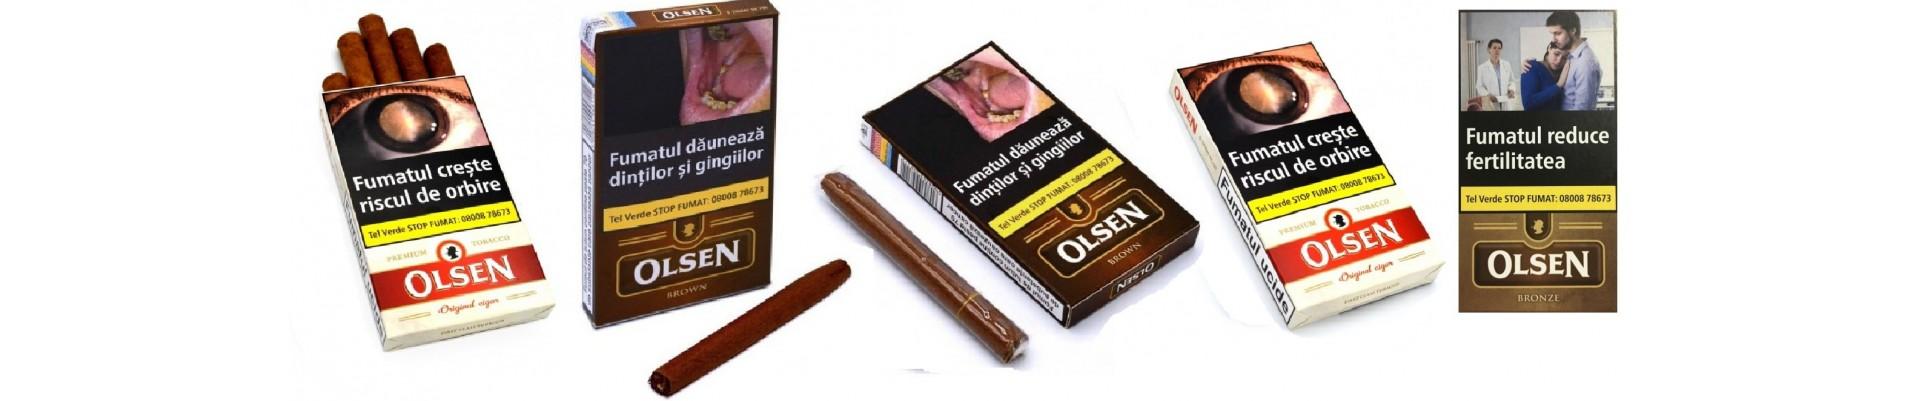 Magazin cu tigari de foi Olsen diverse arome.Cumpar tigari de foi Olsen cu livrare din stoc.Cele mai bune preturi la tigari de foi Olsen Original sau Olsen Vanilie